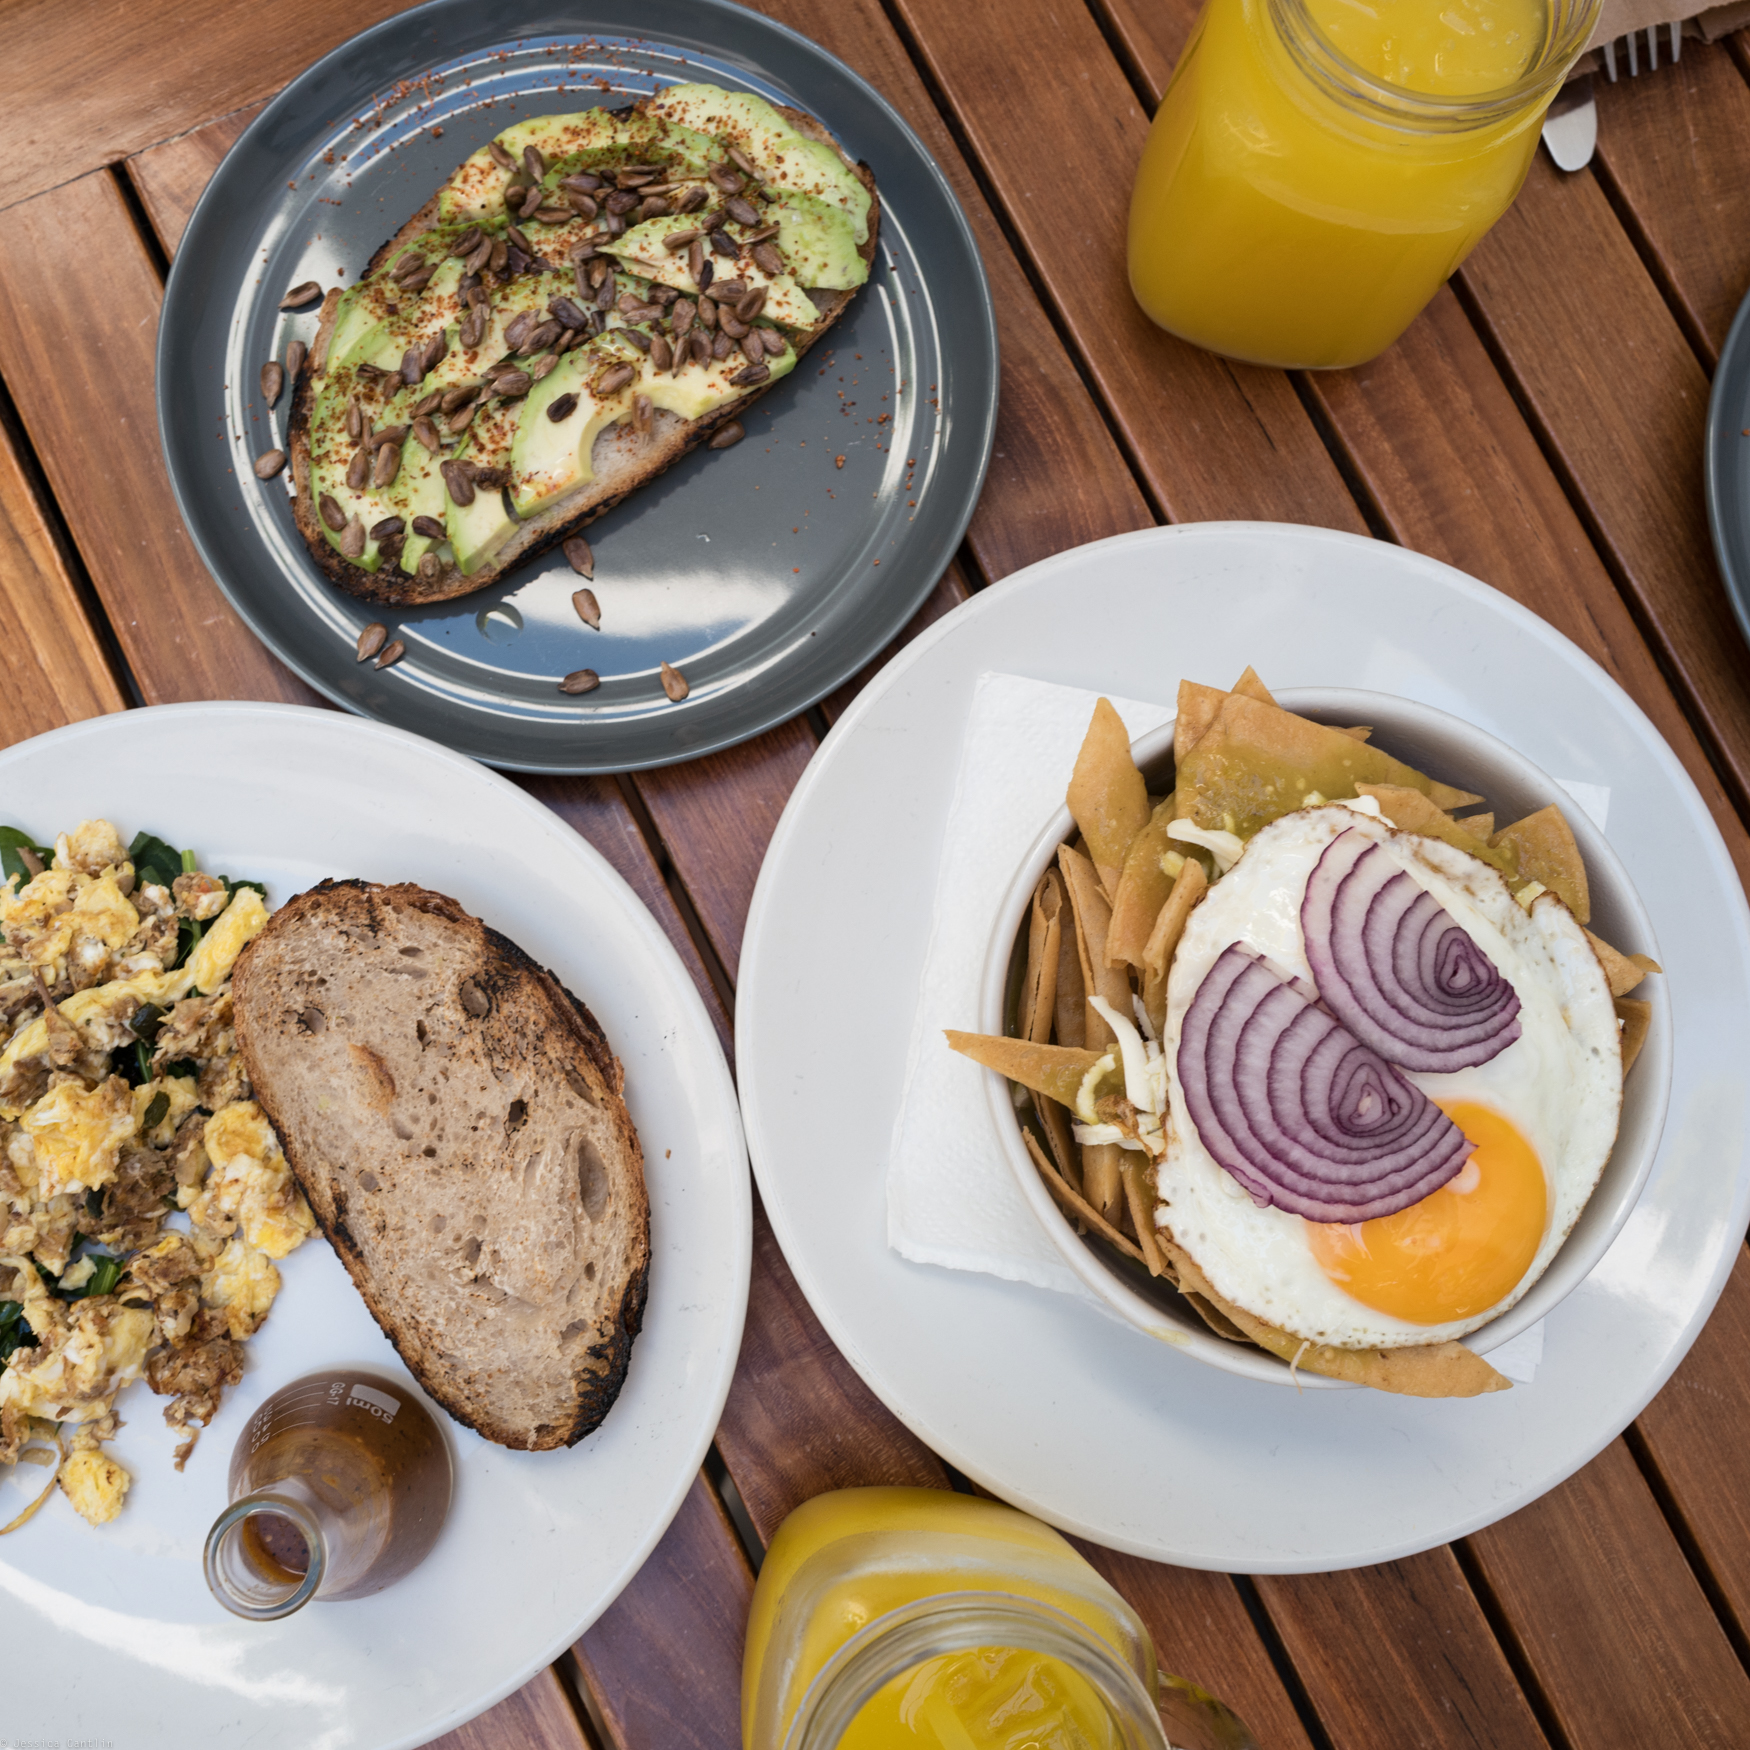 Breakfast at La Panaderia